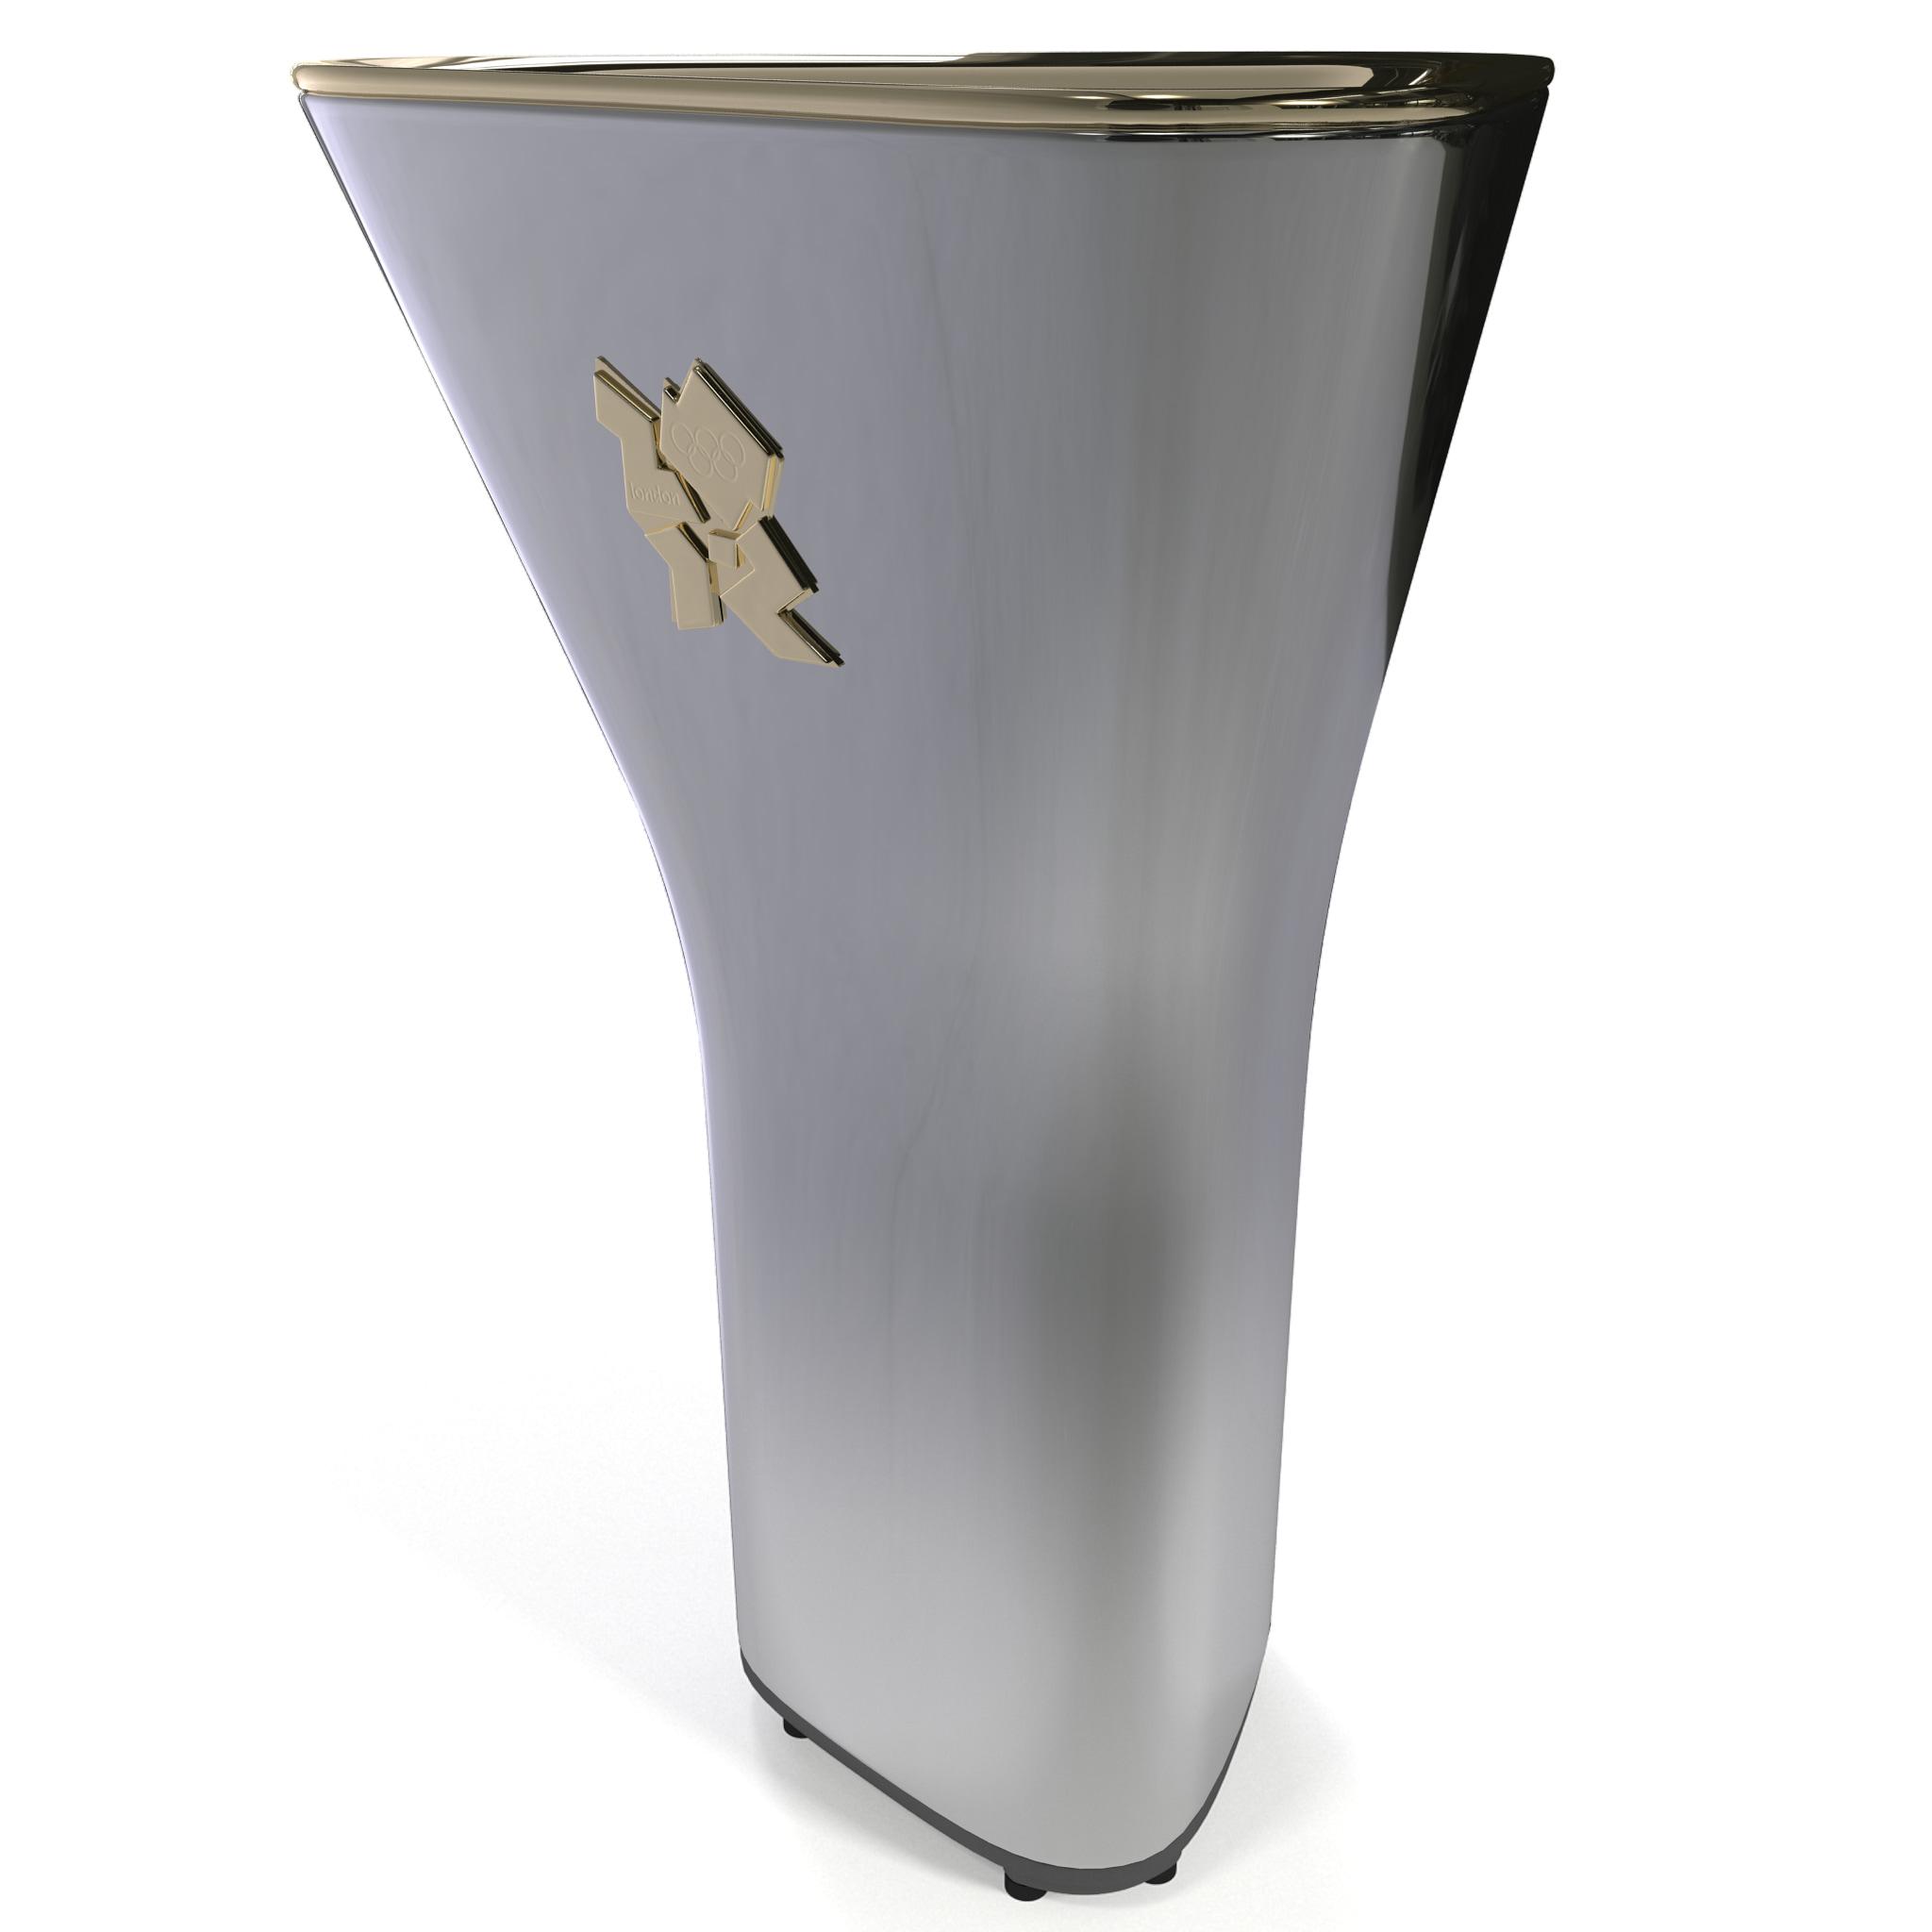 Olympic Torch Cauldron_2.jpg